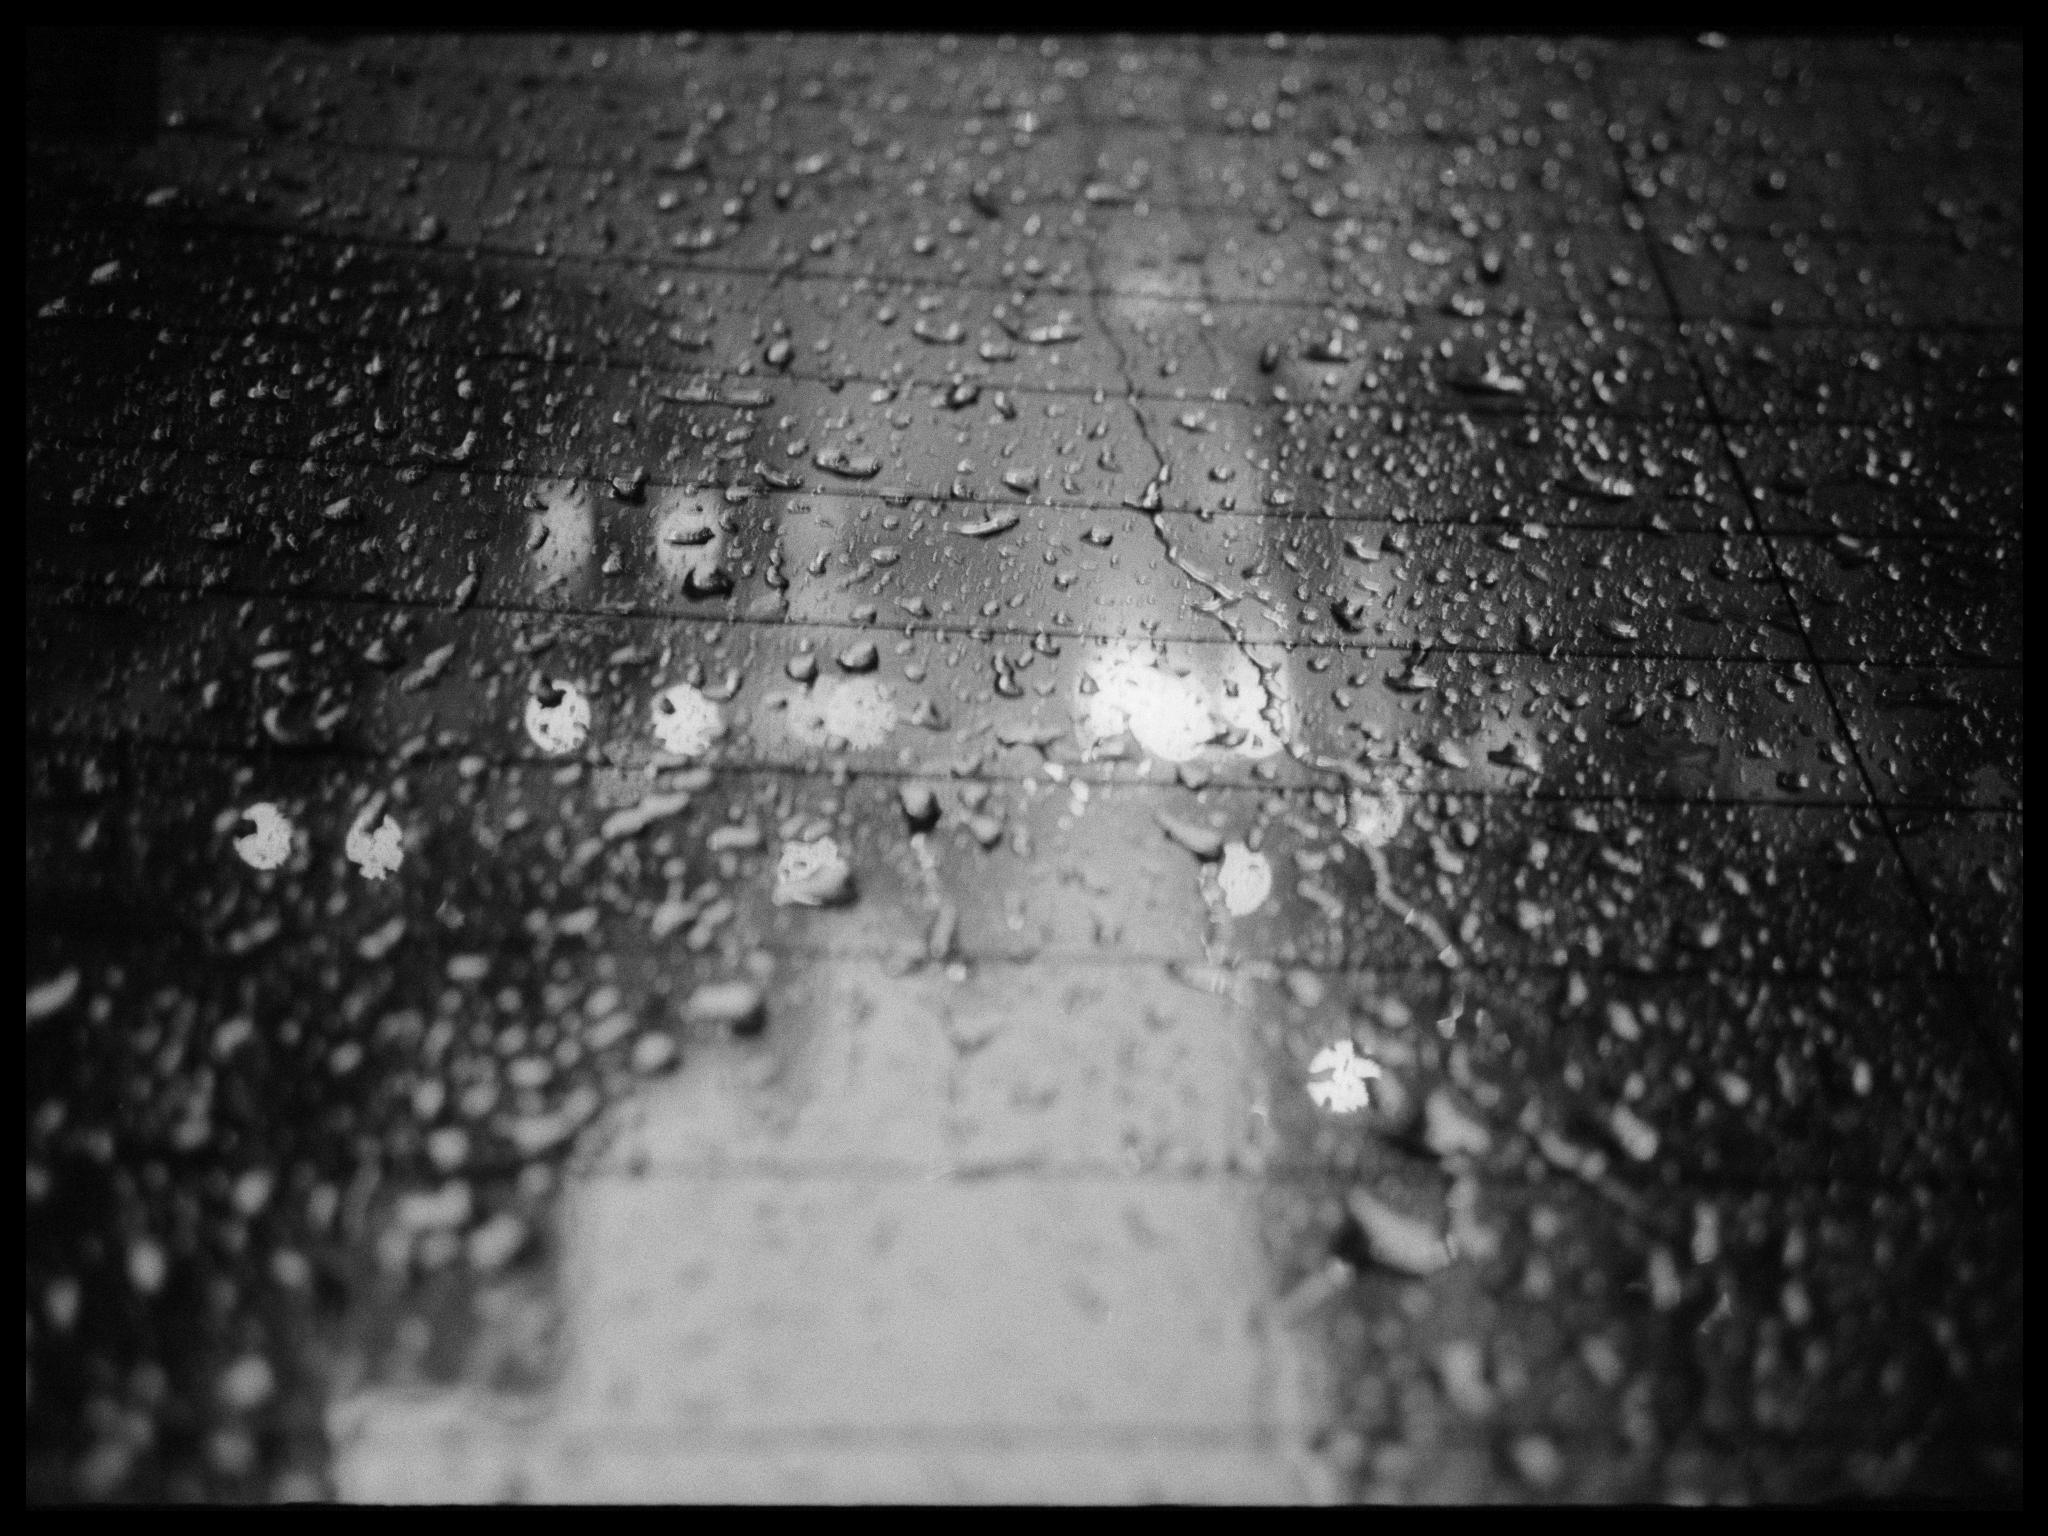 Debora-Francis-Little-Moments-1-01.jpg